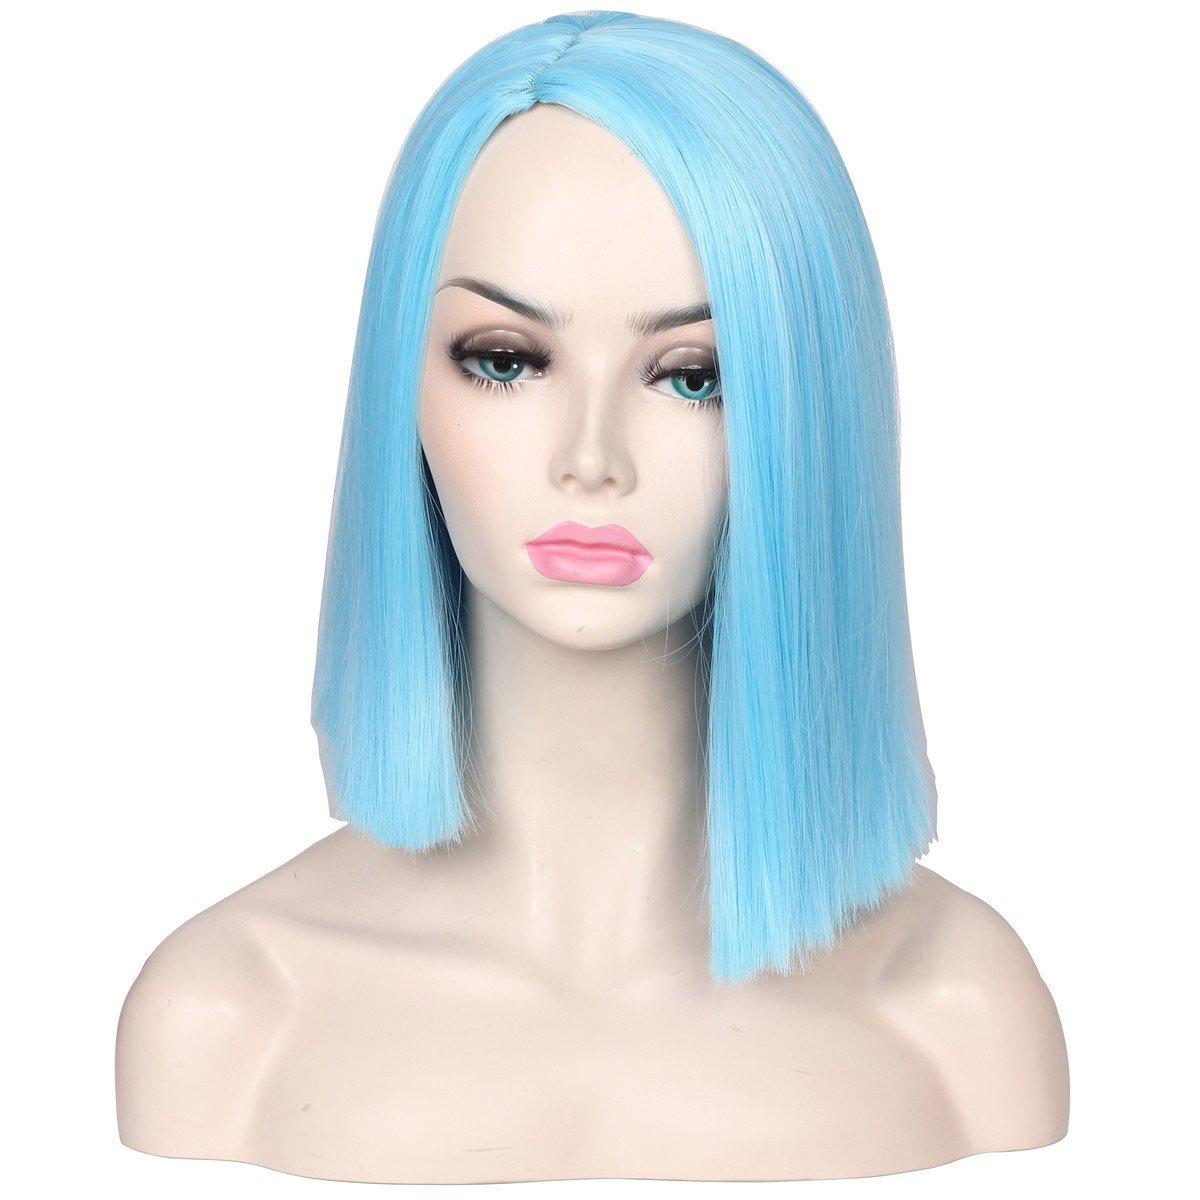 ColorGround Medium Long Straight Light Blue Part Splited Cosplay Wig